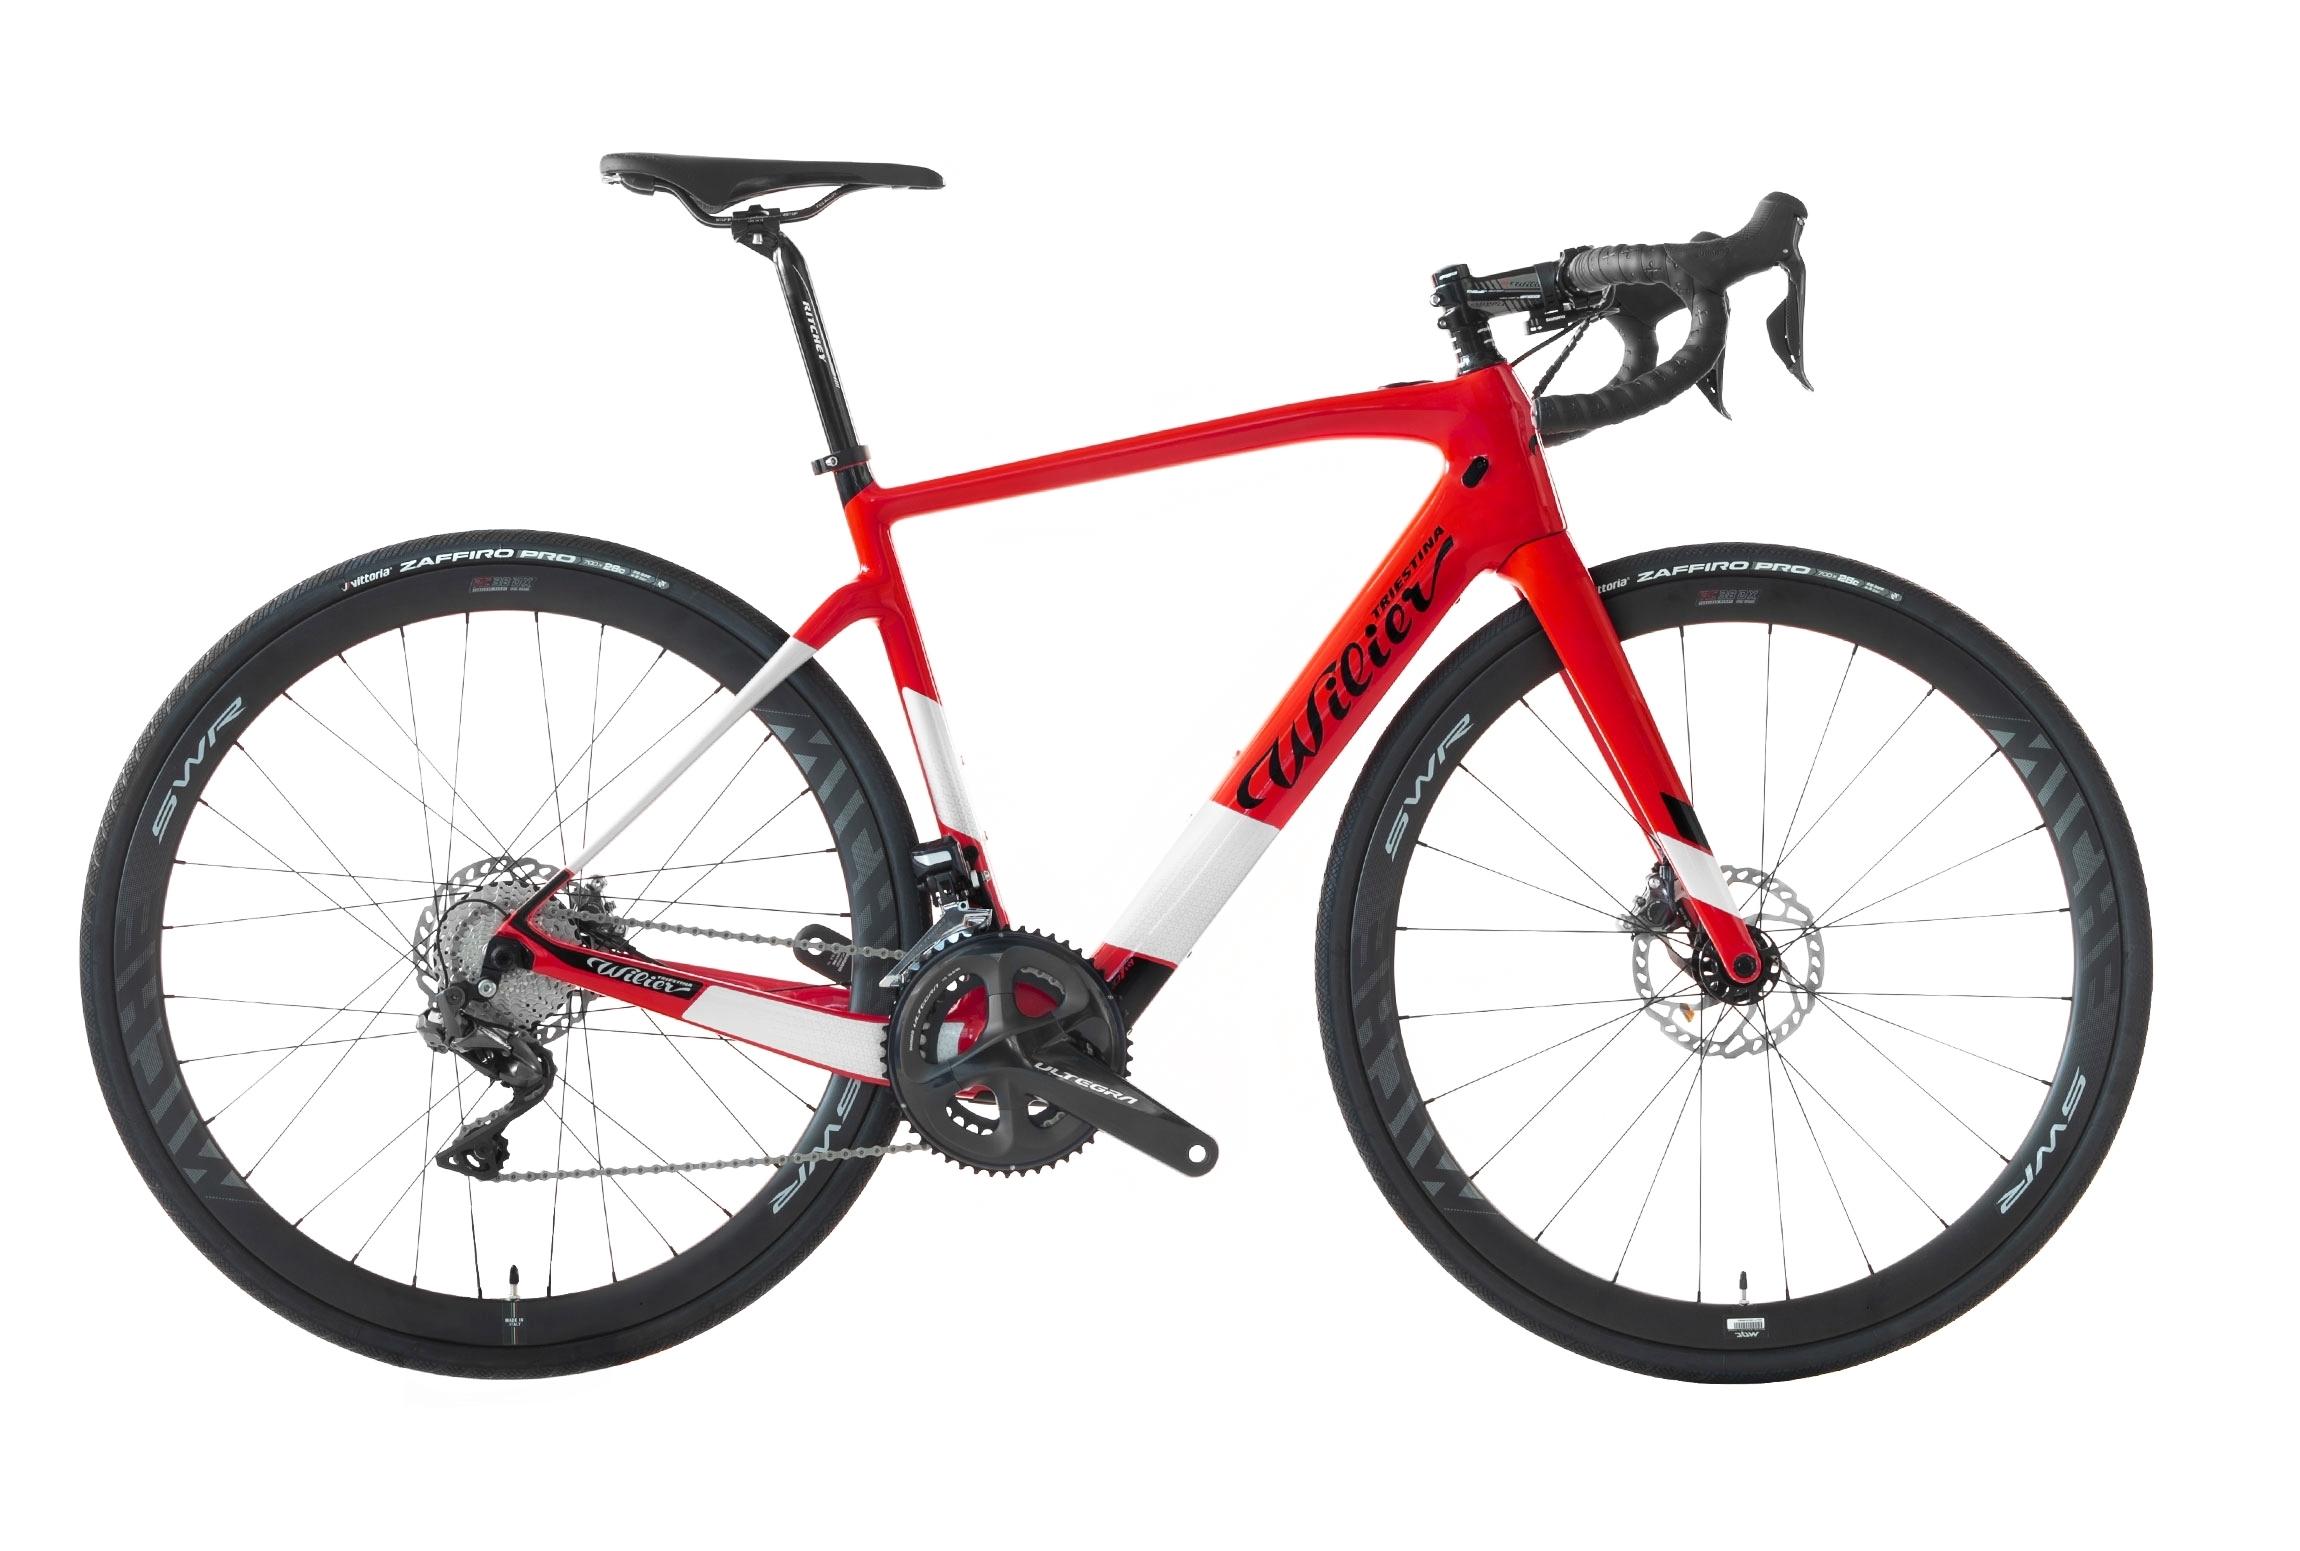 kolo CENTO1HY + ULTEGRA R8020 + MICHE red glossy M